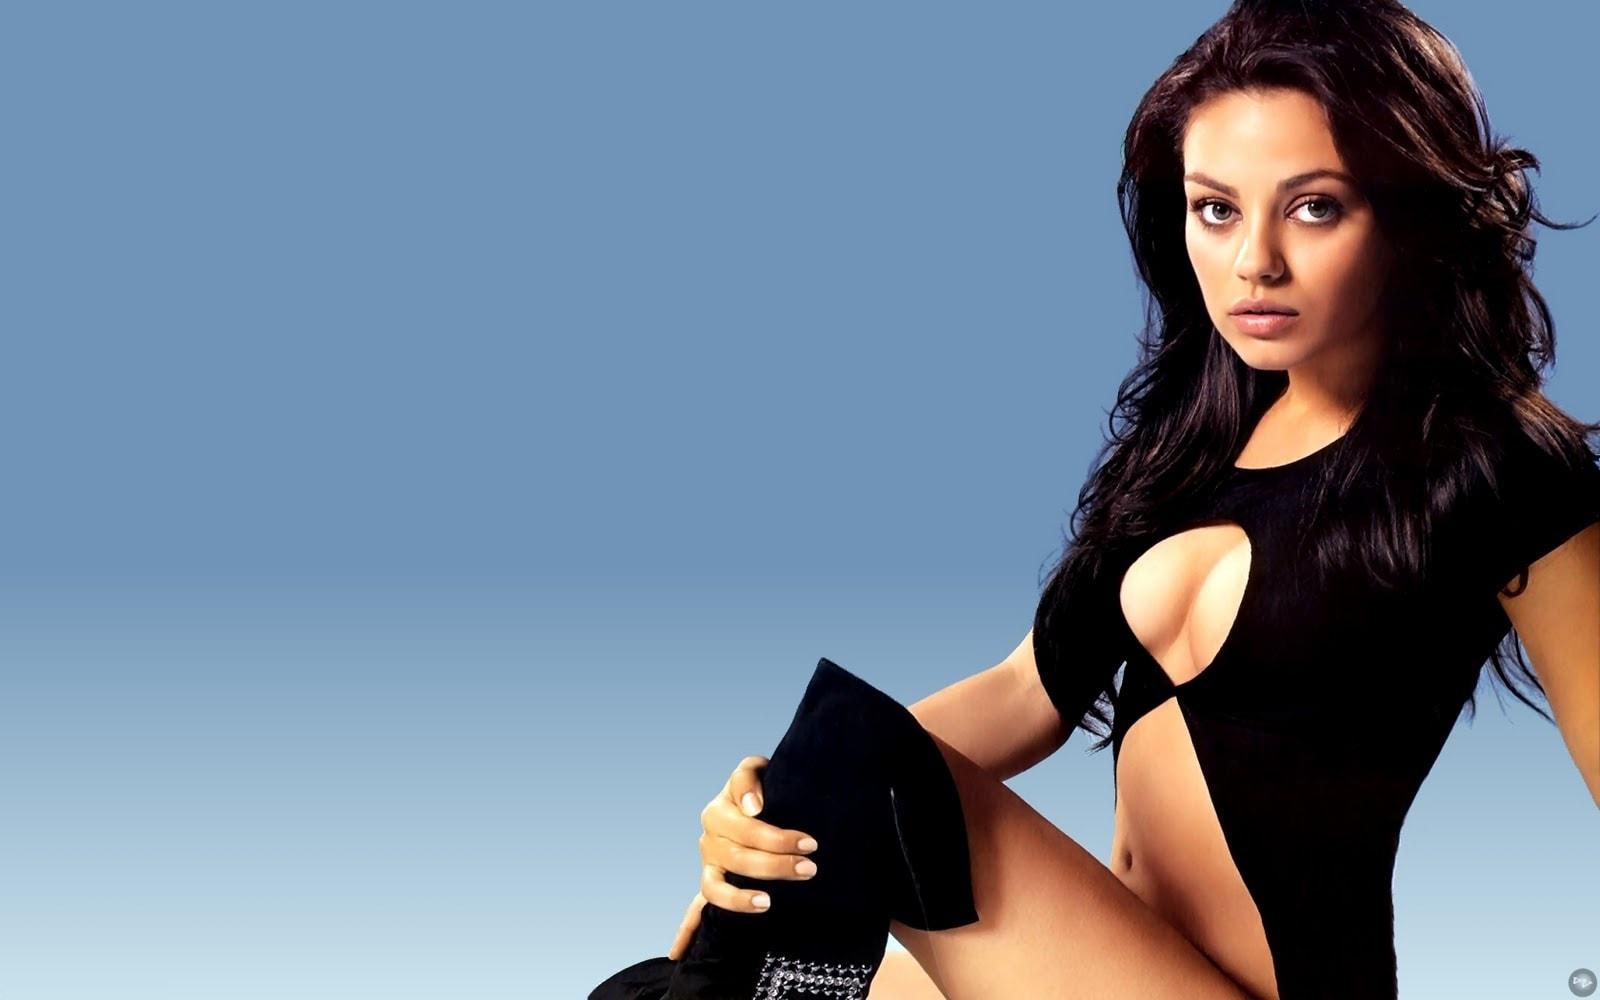 Mila Kunis Backgrounds